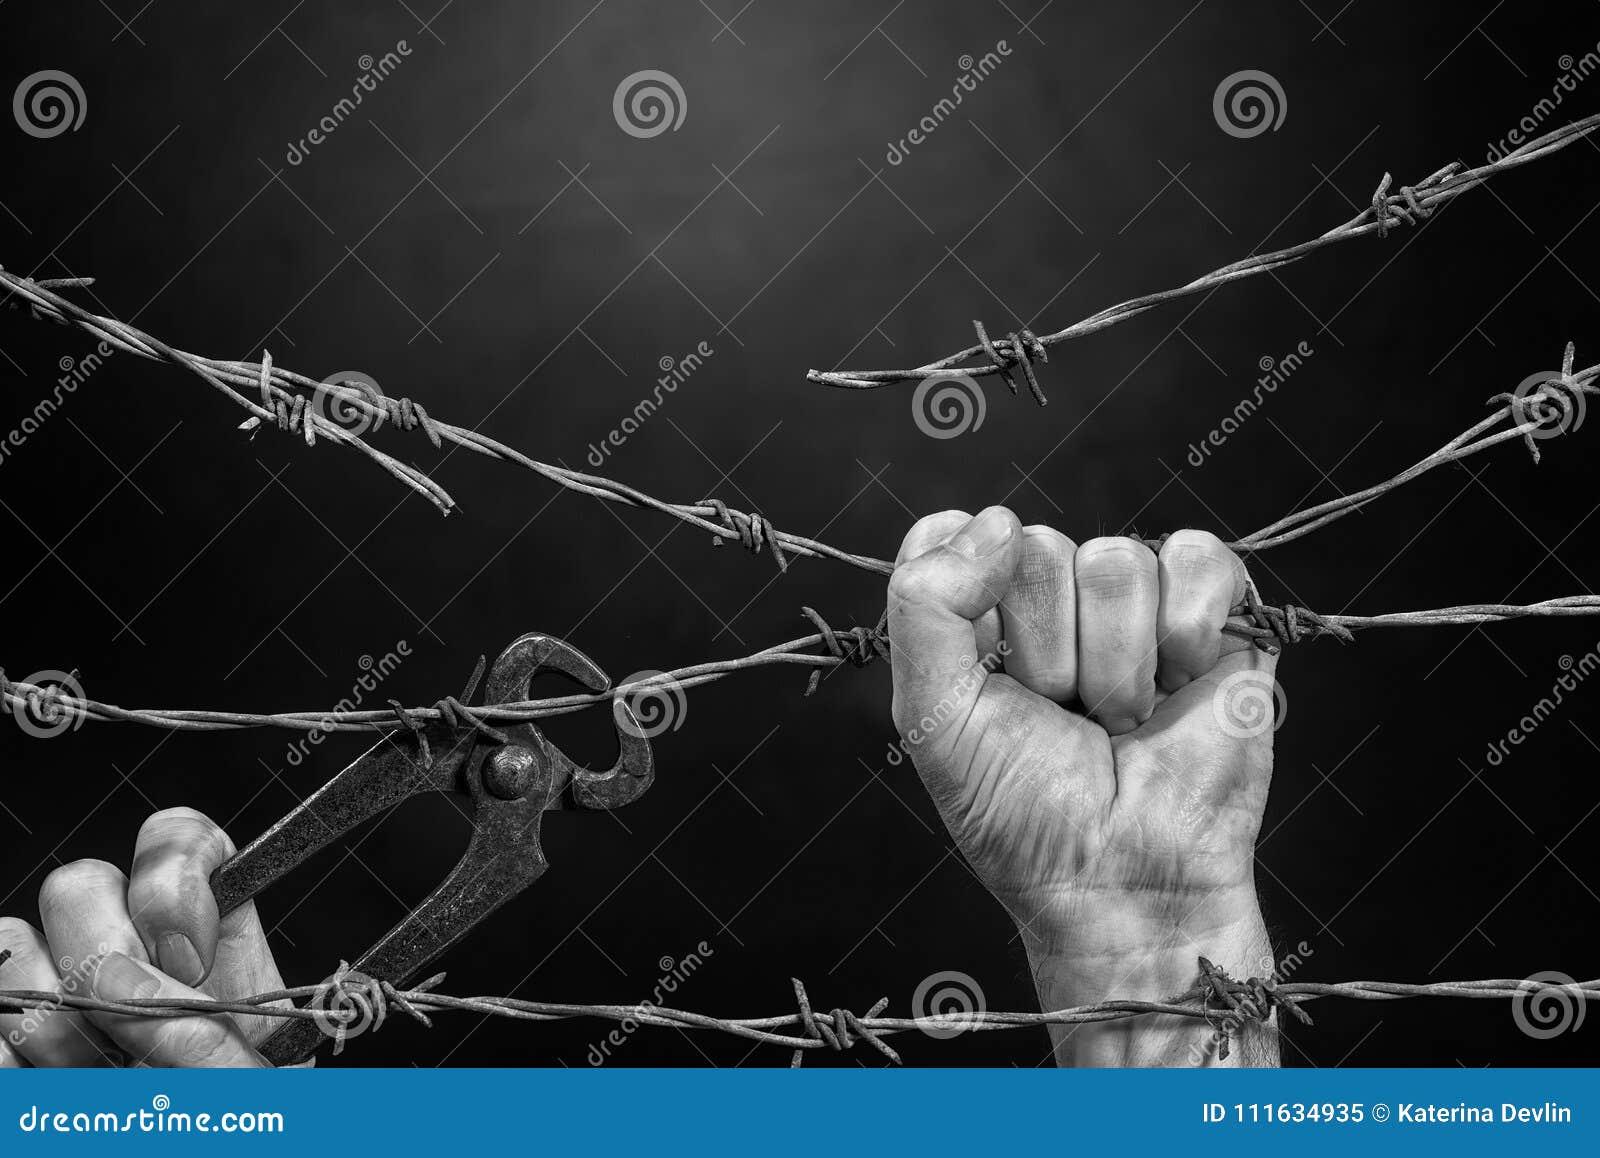 Man is Cutting a Fence